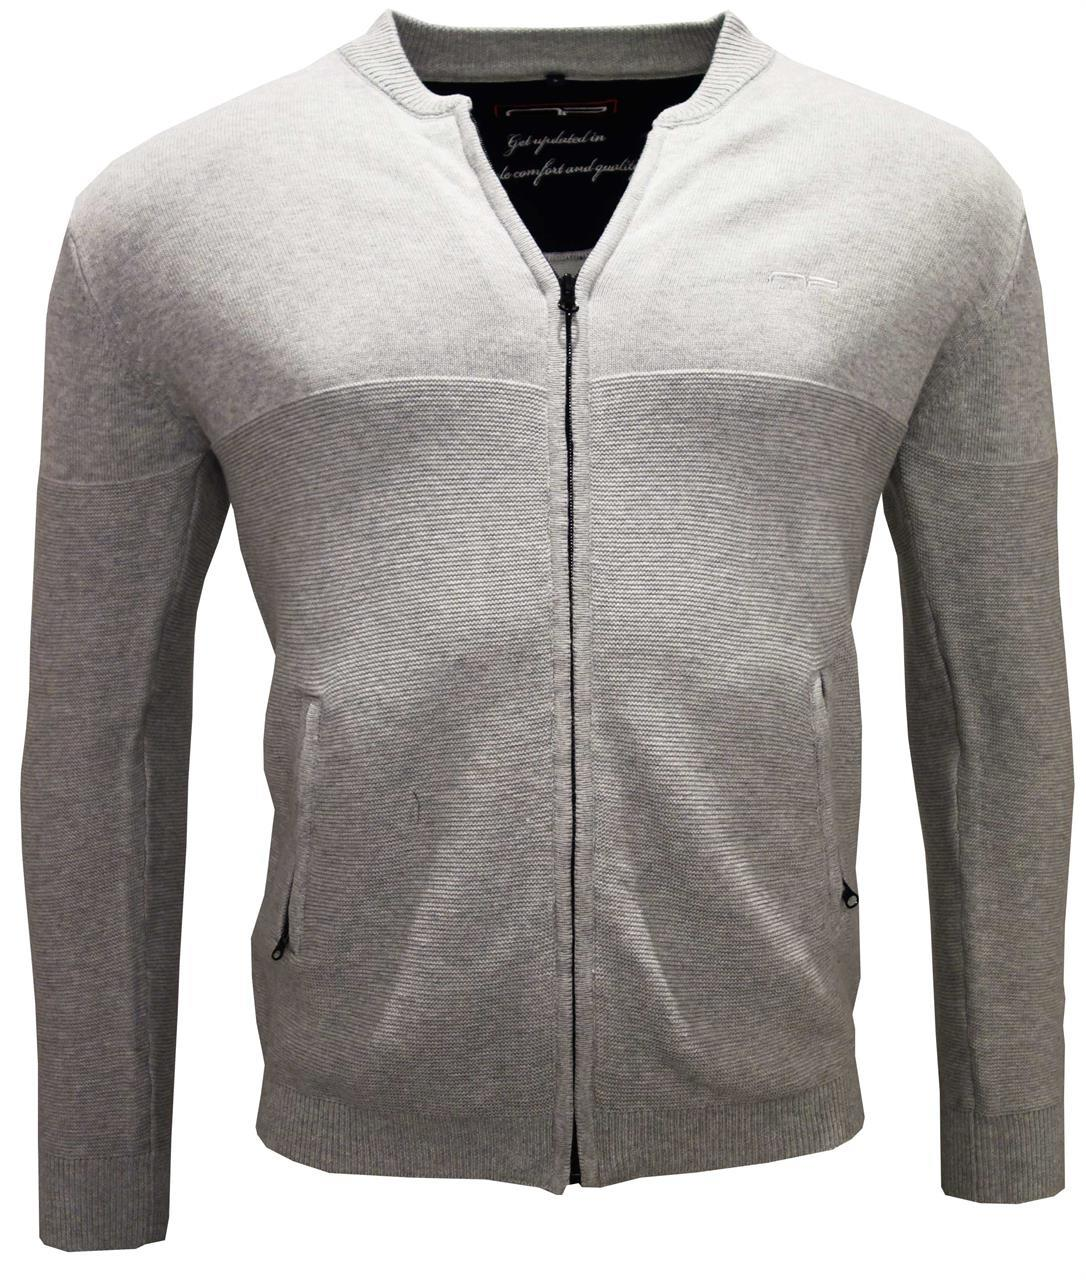 Zip Cardigan 2073 L Grey S